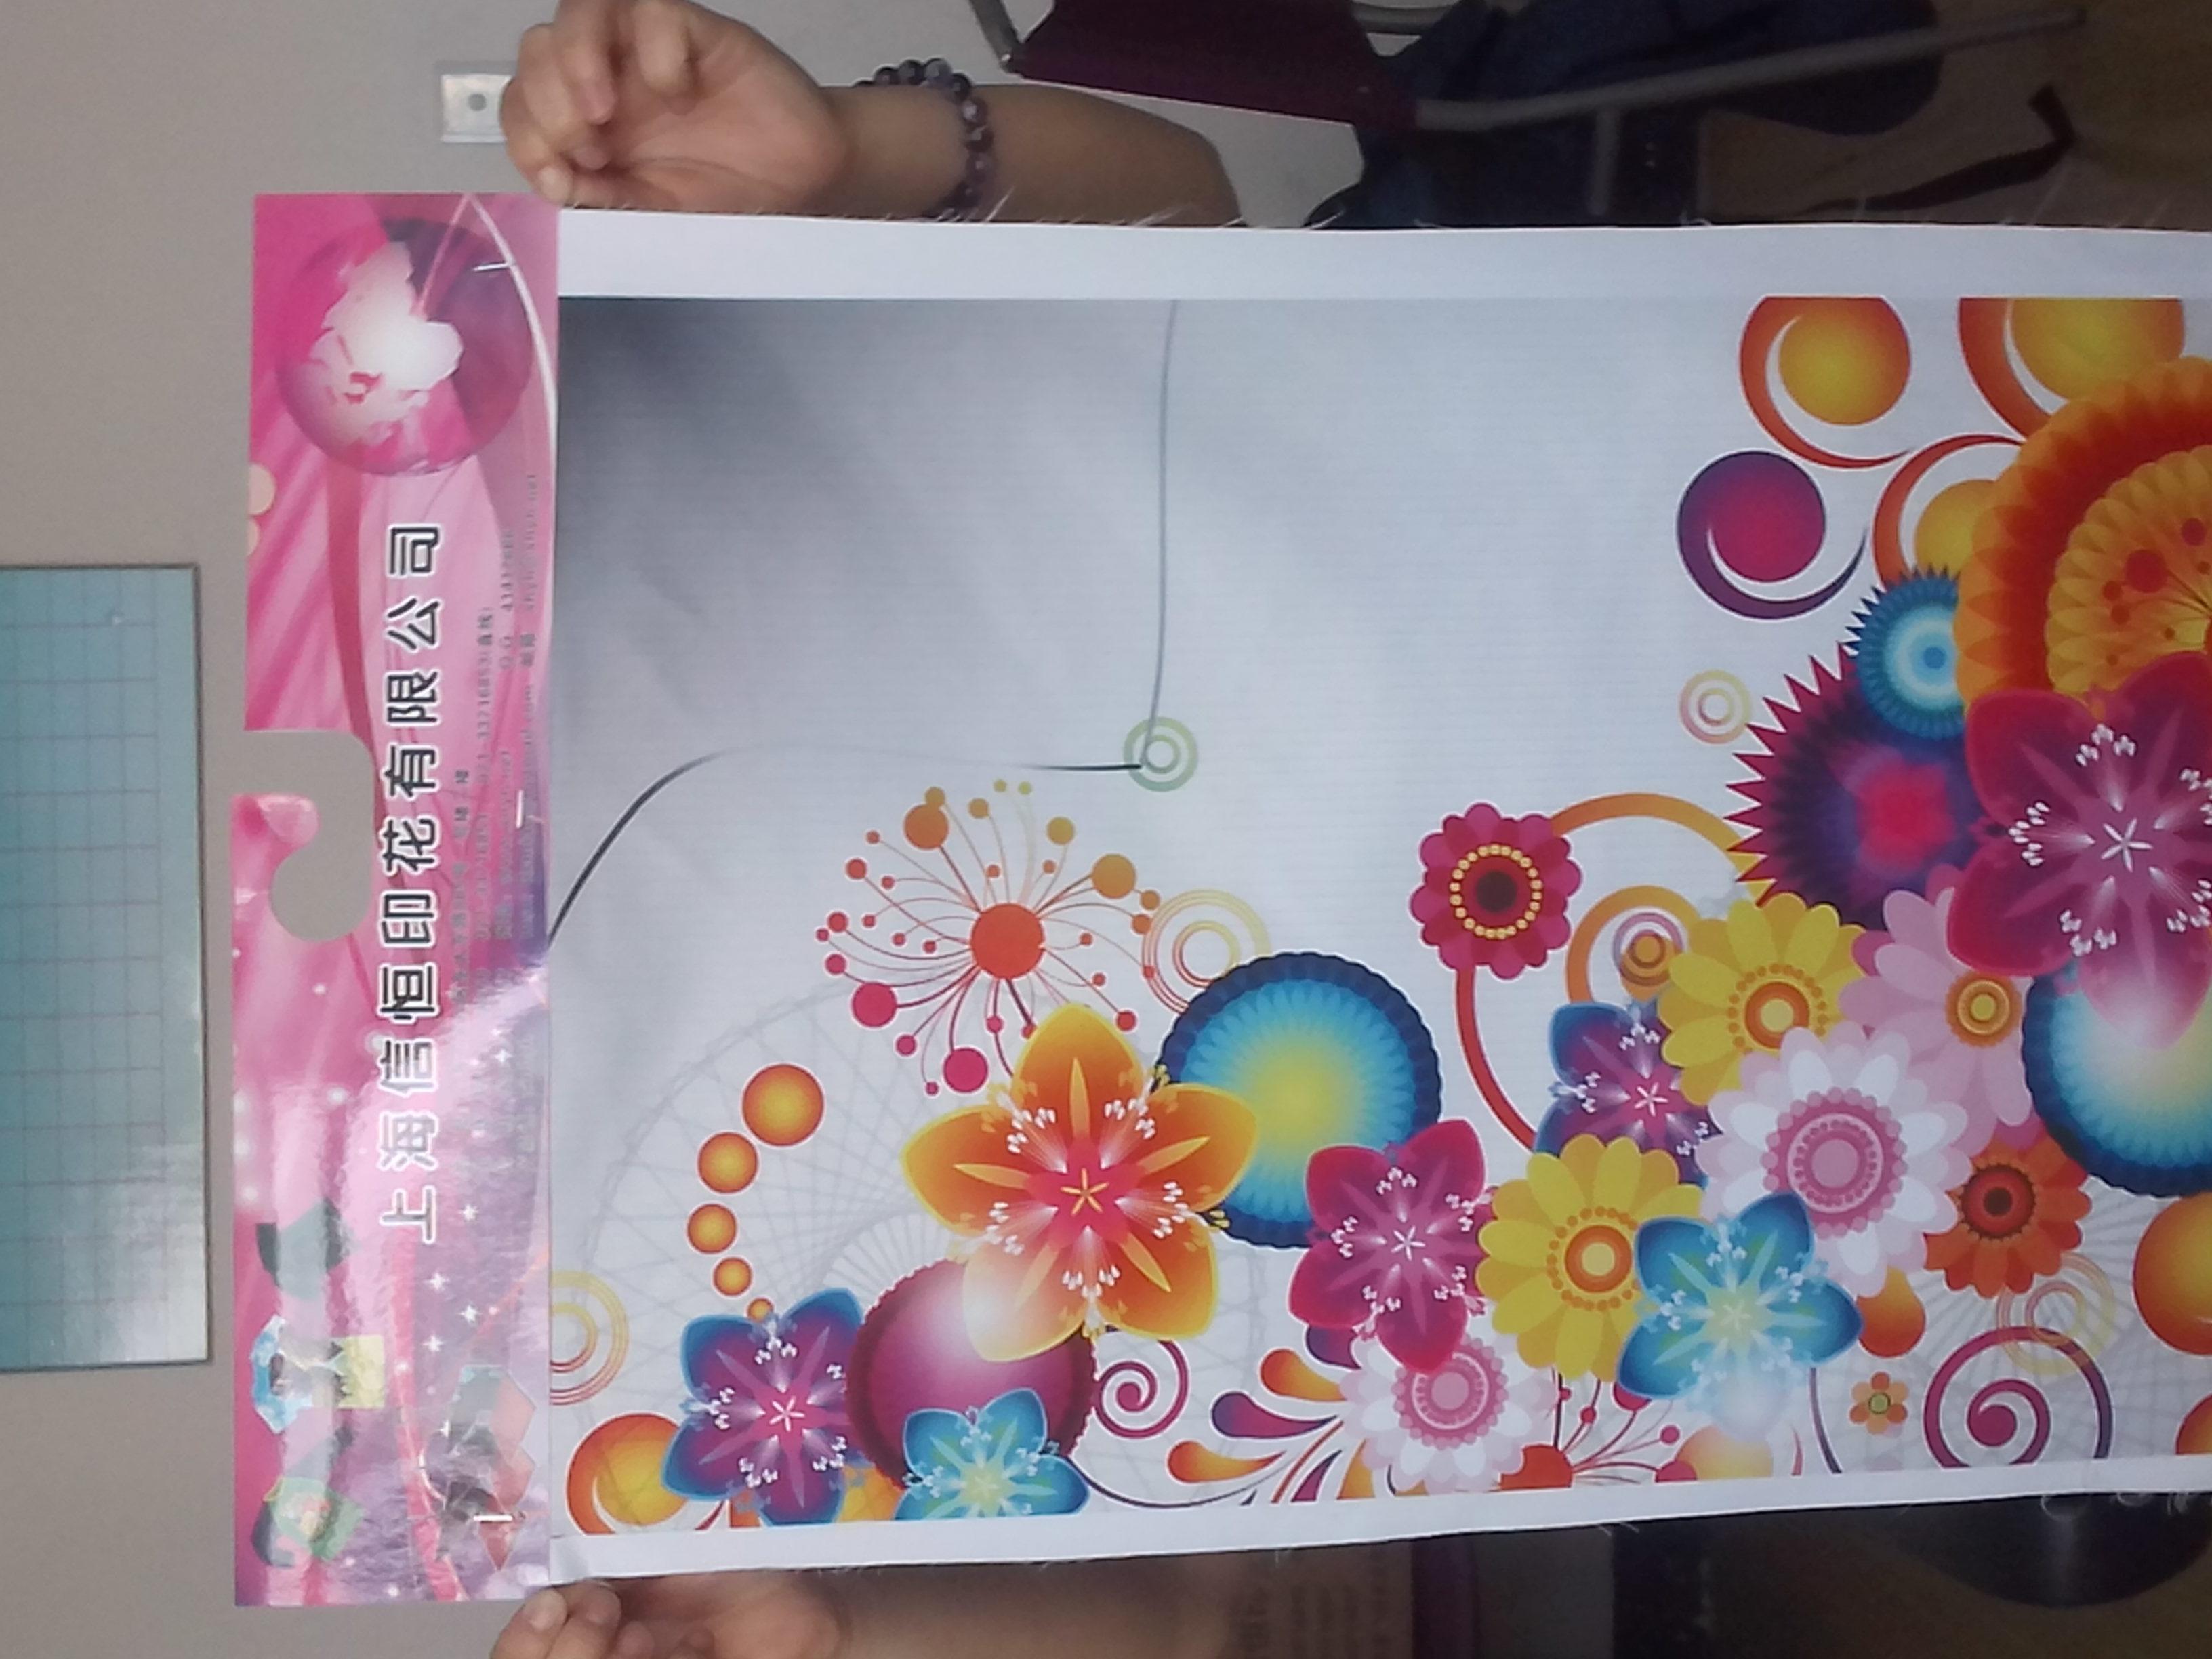 logo/高弹力骑车服热转移印花 logo烫画...